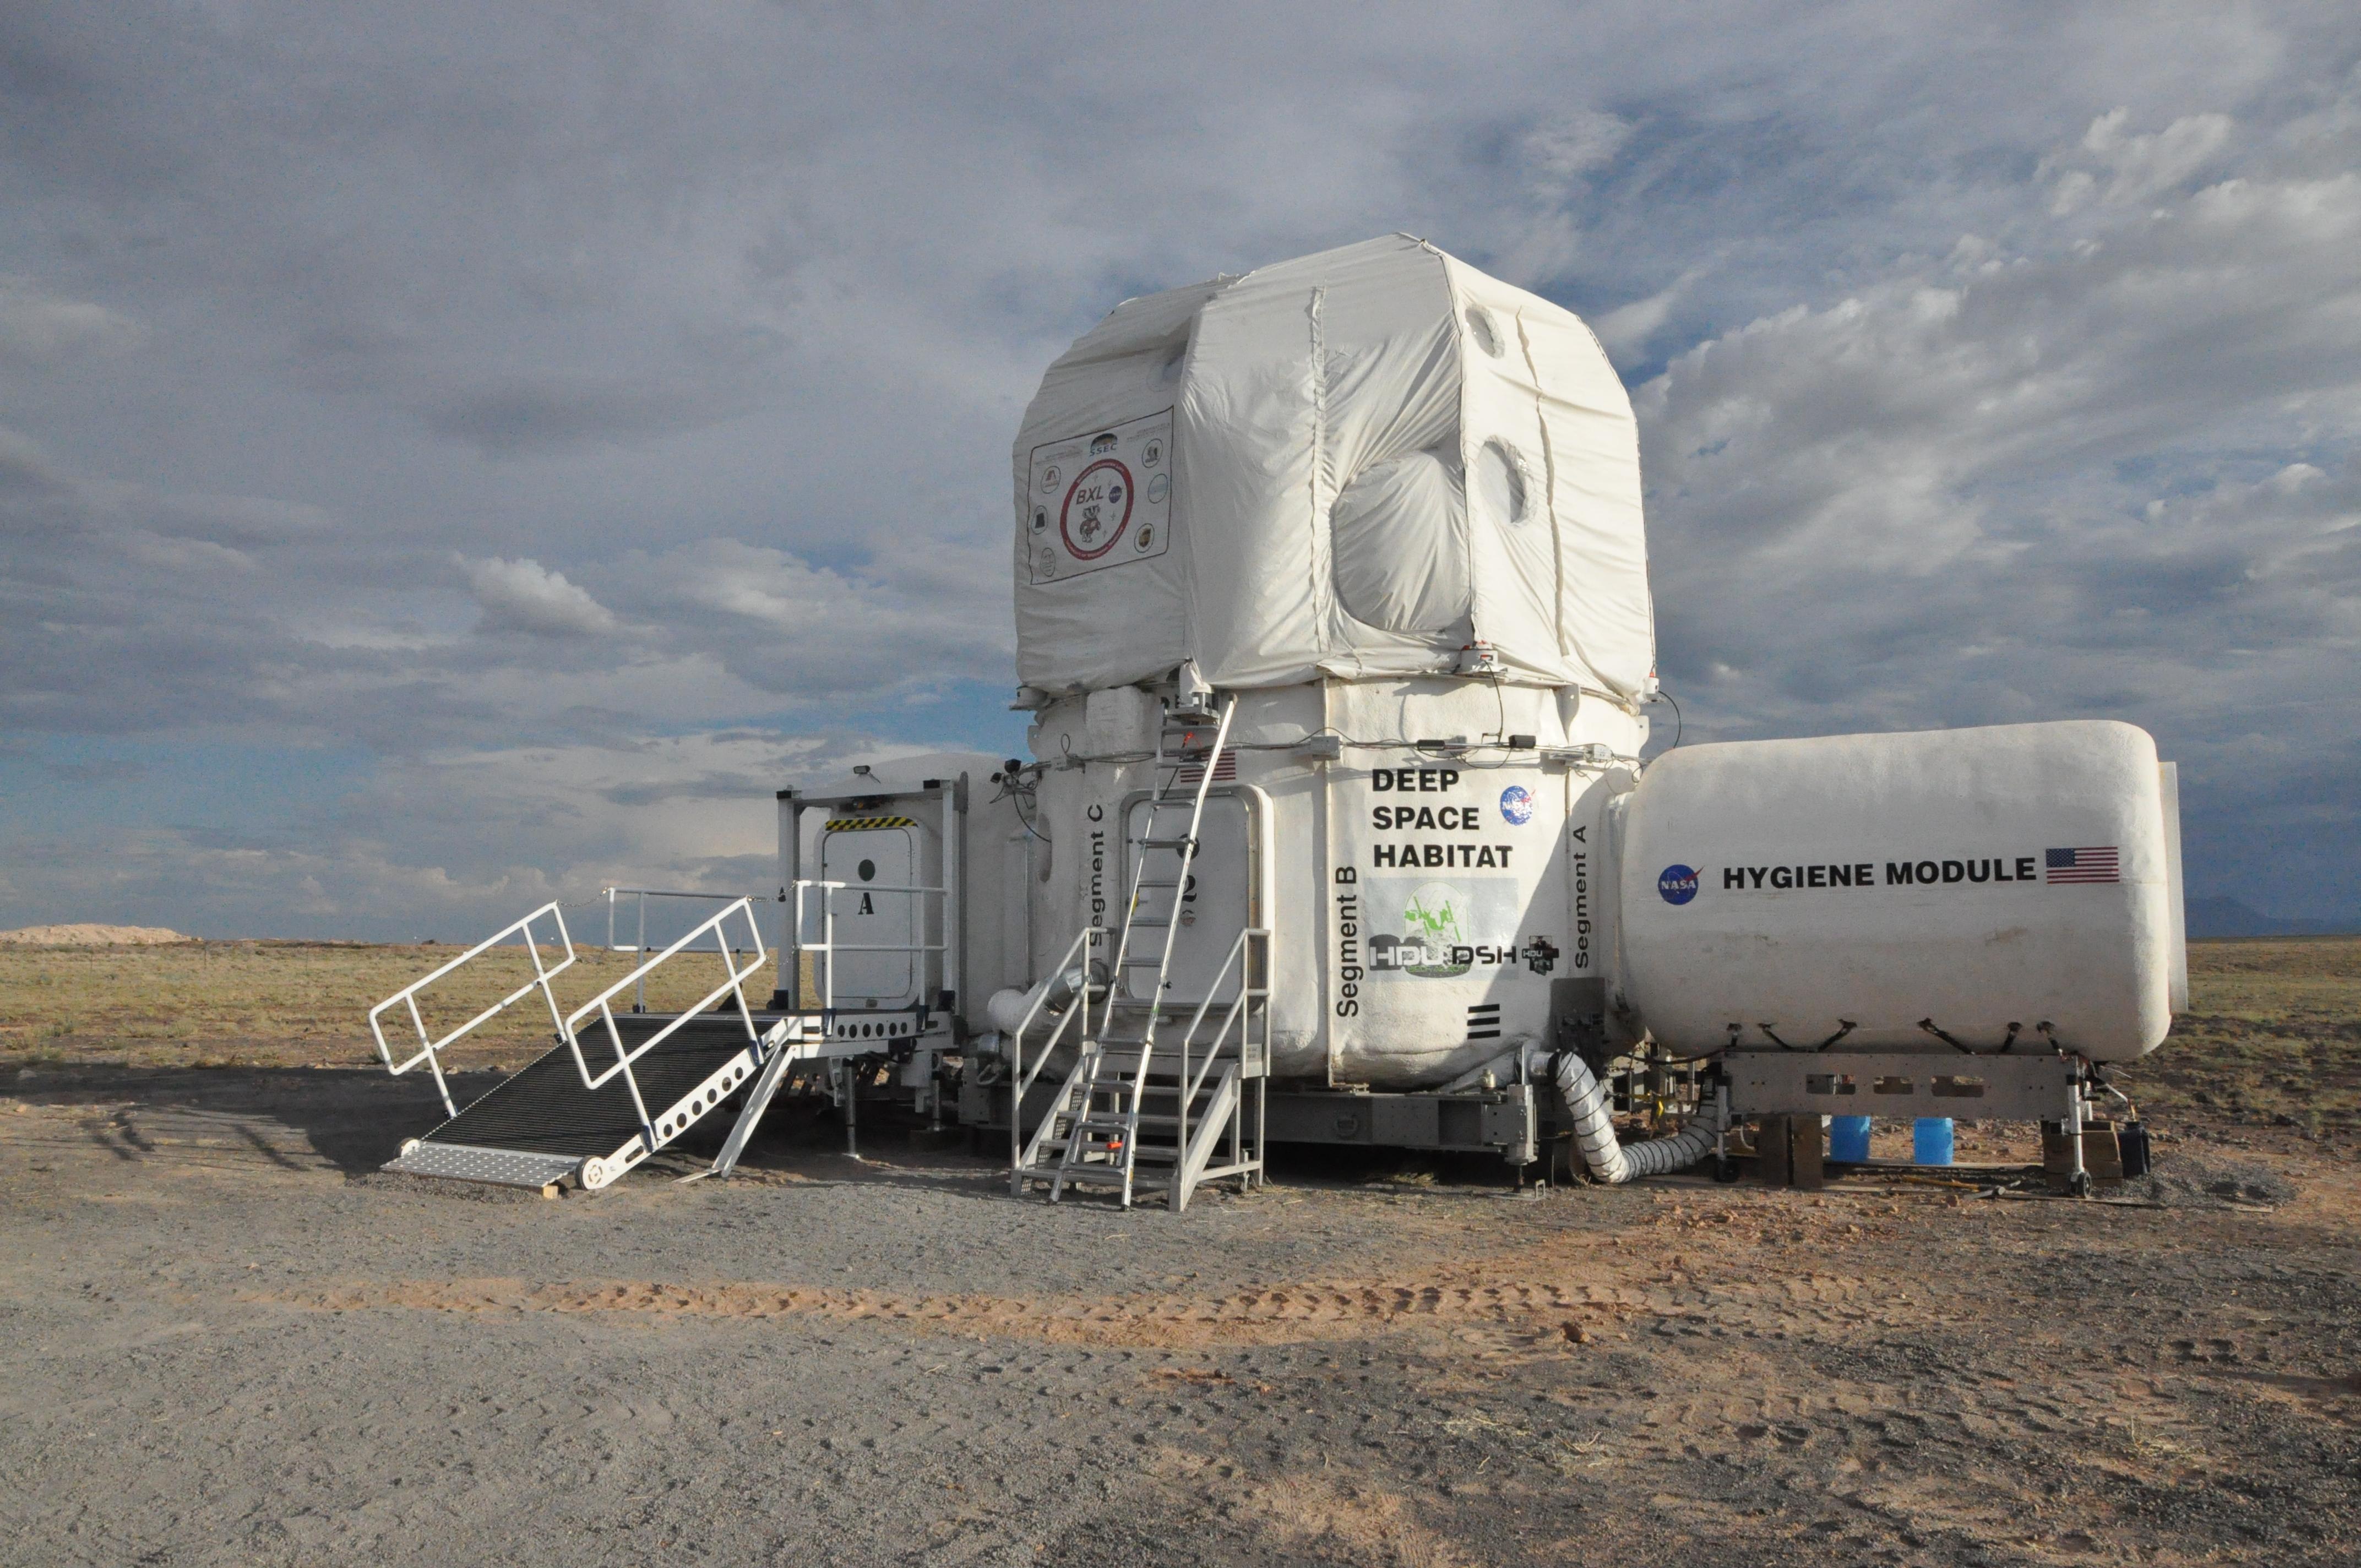 astronaut space habitat - photo #23